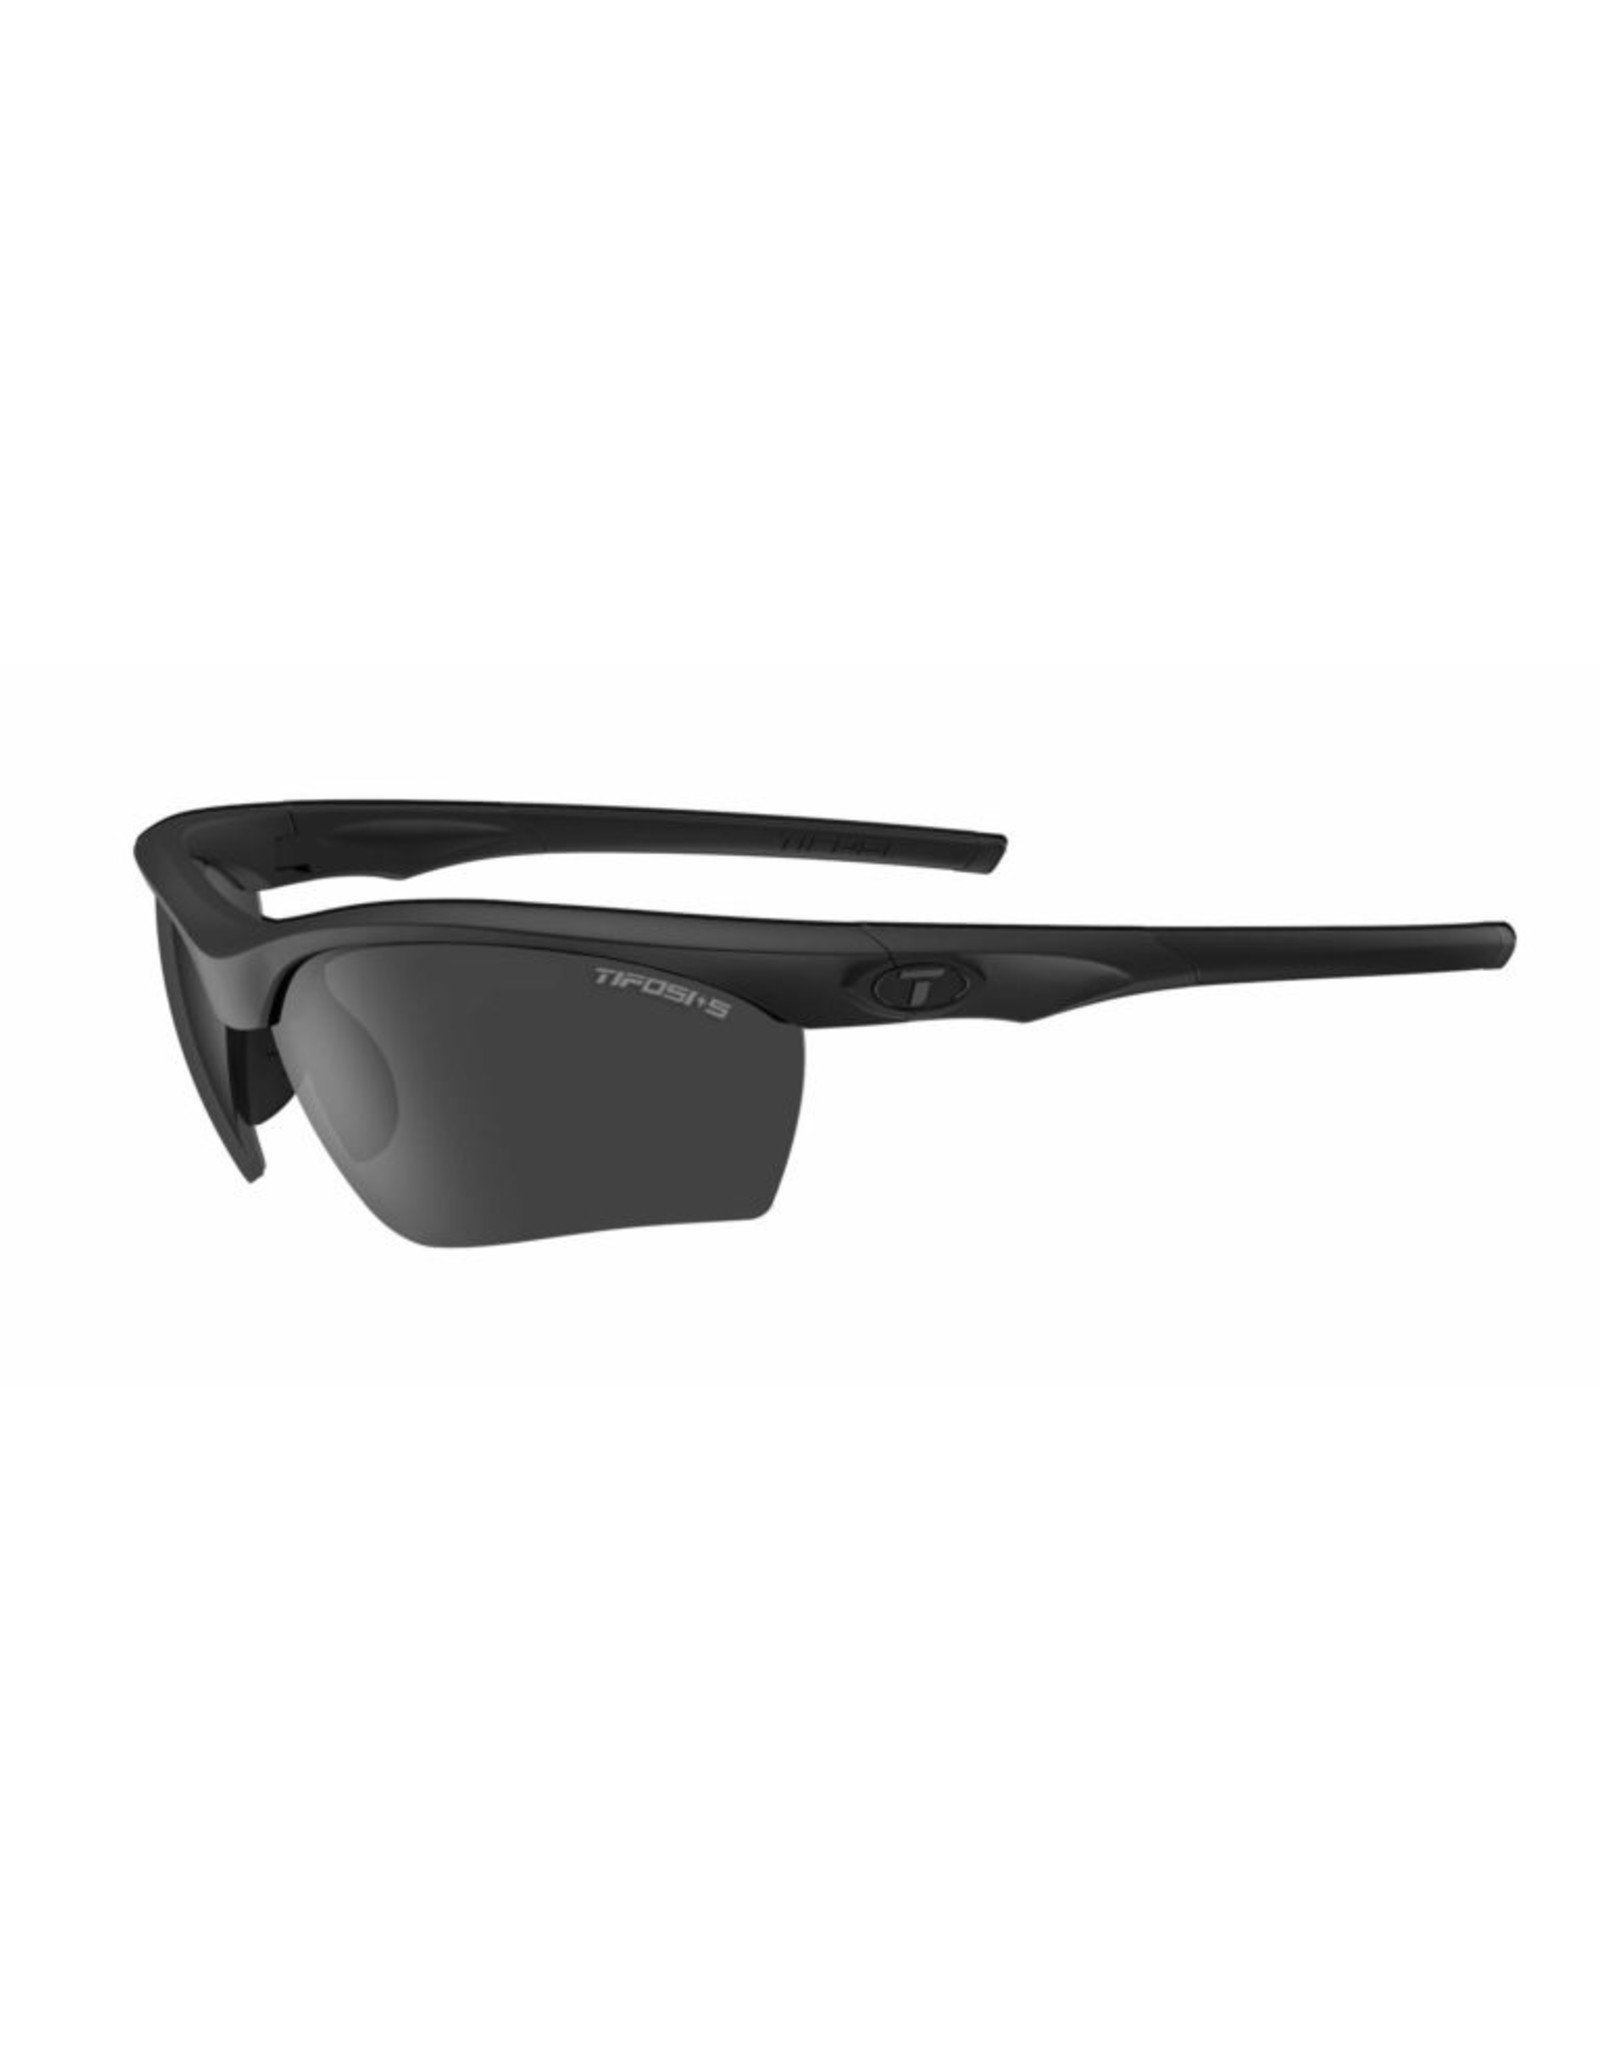 Tifosi Optics Z87.1 Vero, Matte Black Tactical Safety Sunglasses - Smoke/HC Red/Clear